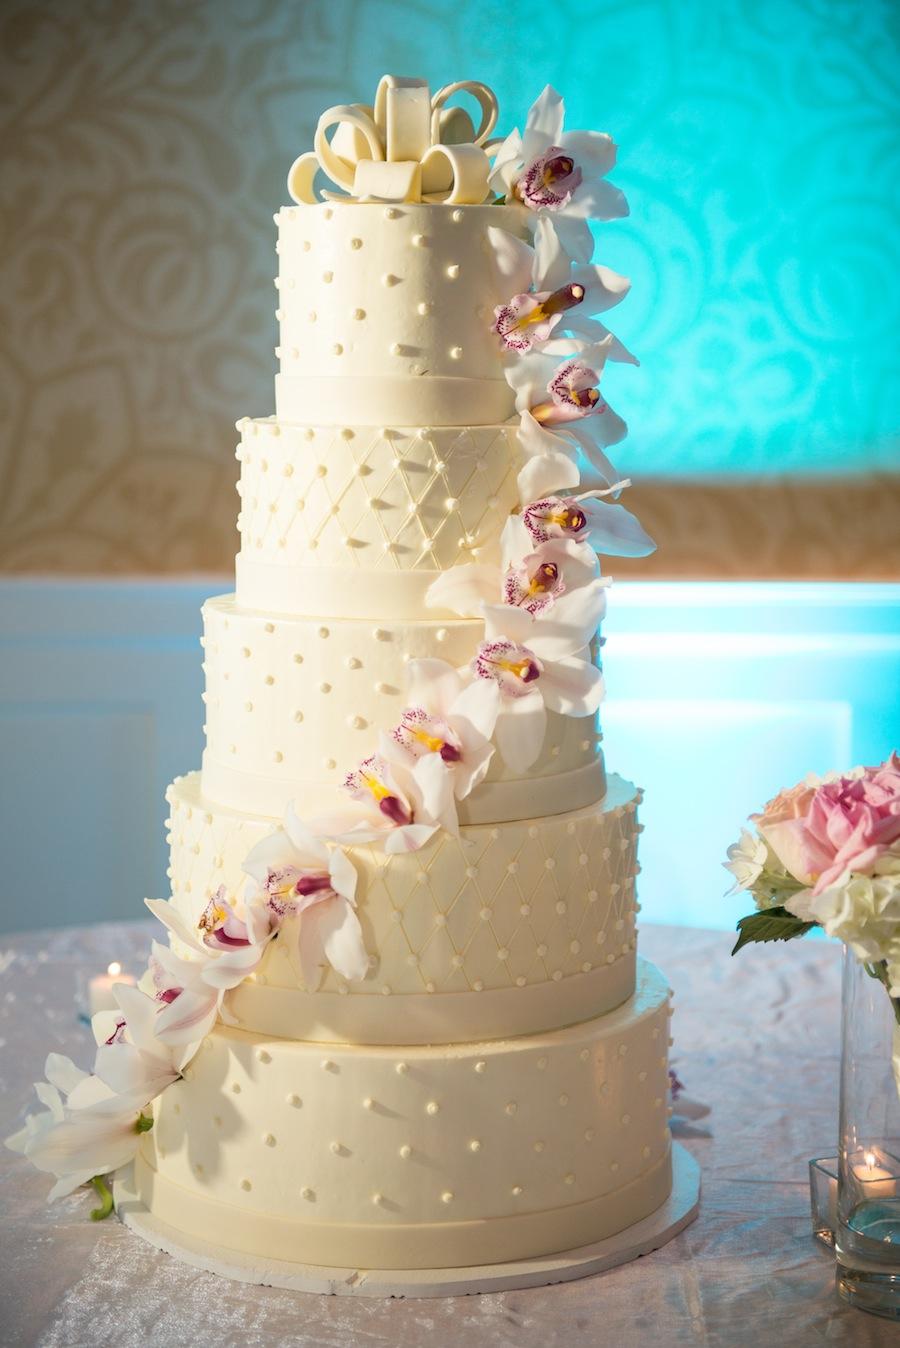 5 Tier Round White Wedding Cake With Flowers Tall Wedding Cake